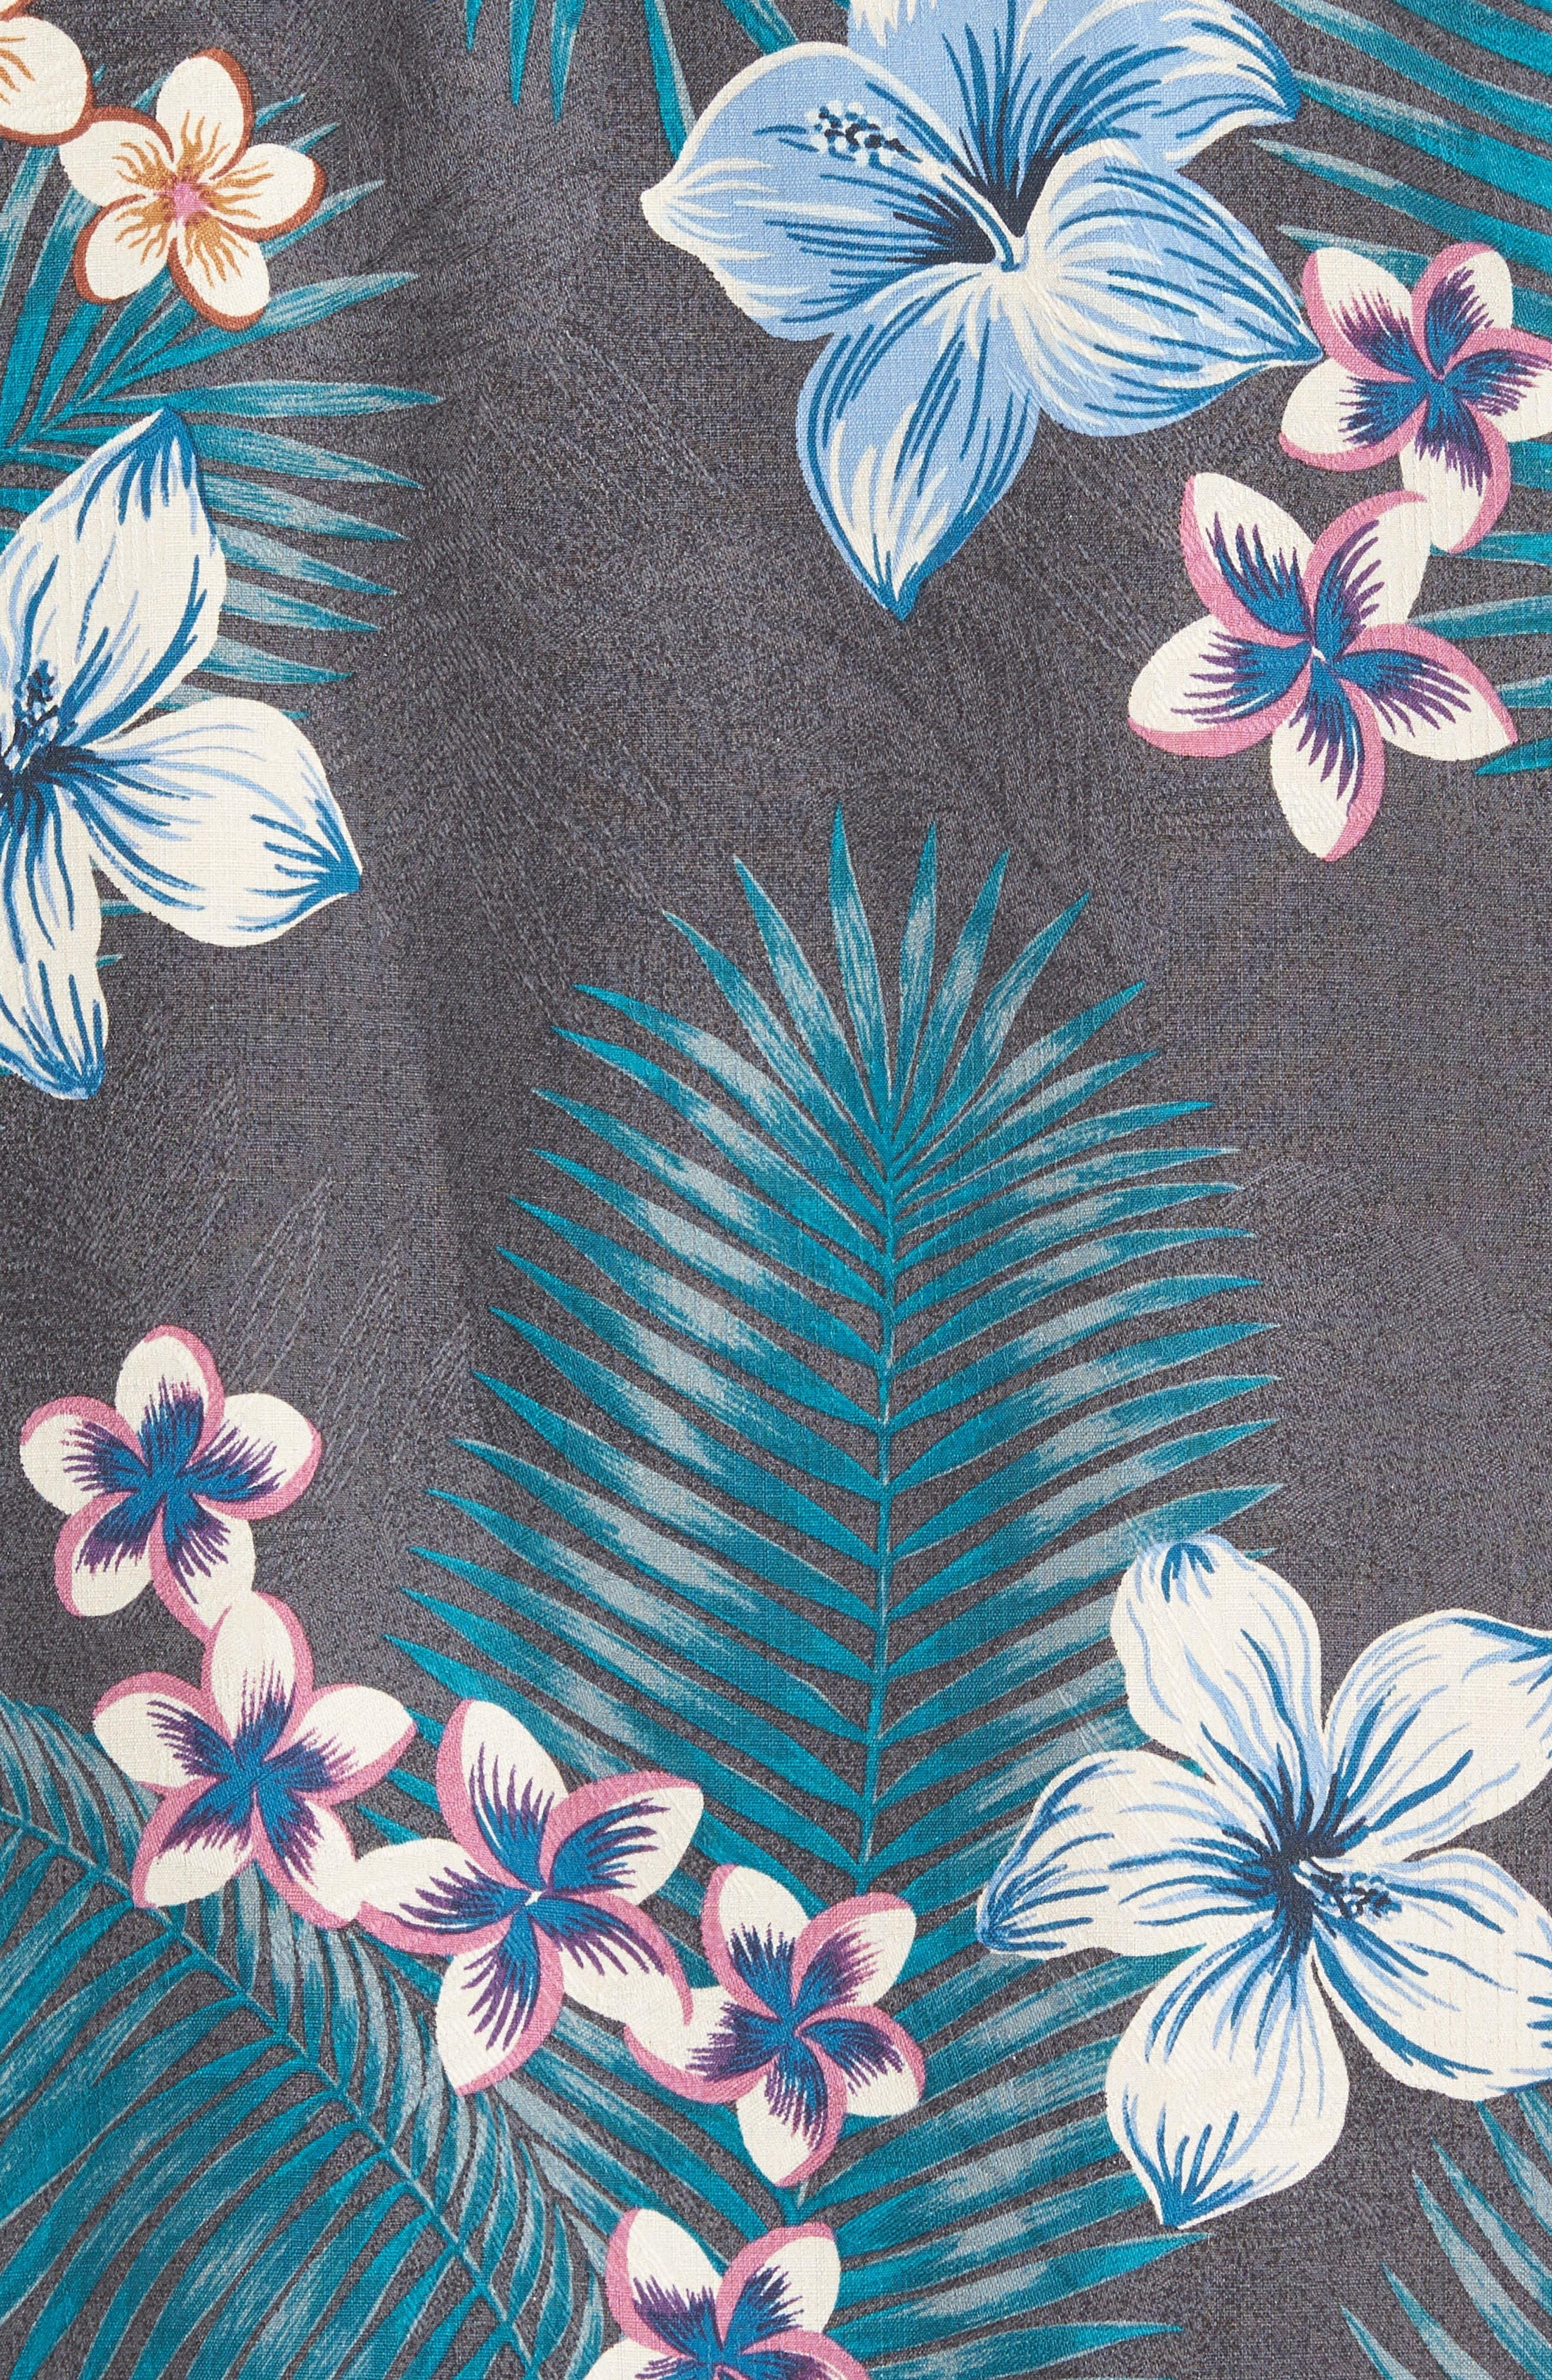 Marjorelle Blooms Silk Woven Shirt,                             Alternate thumbnail 5, color,                             001